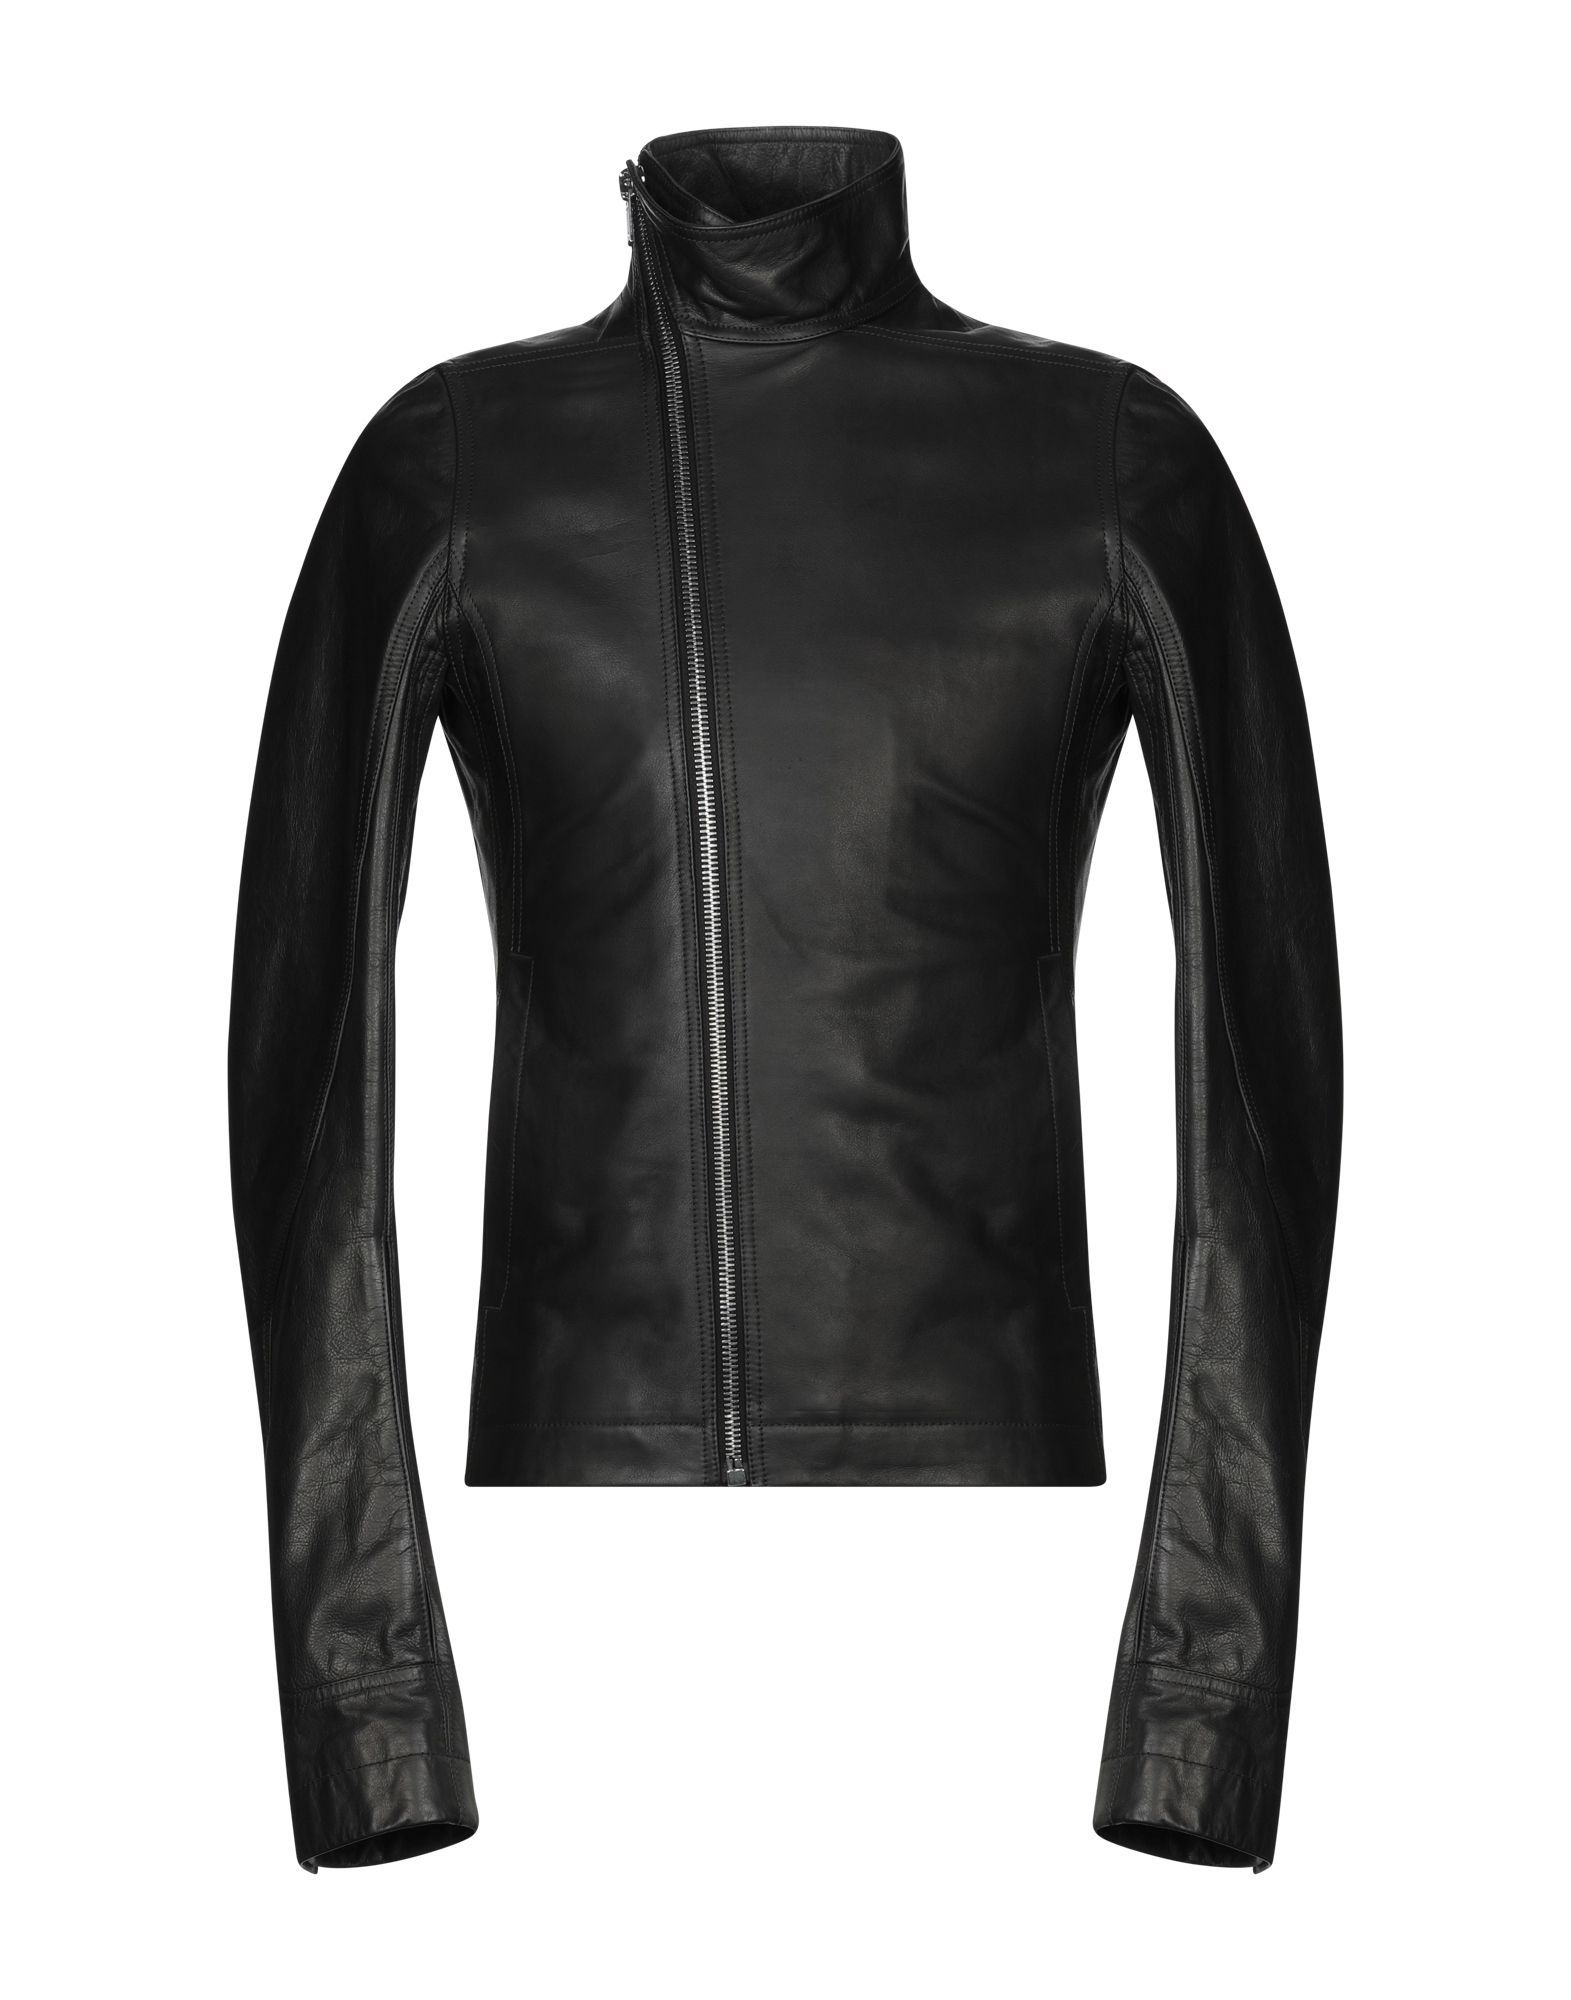 Rick Owens Black Calf Leather Jacket